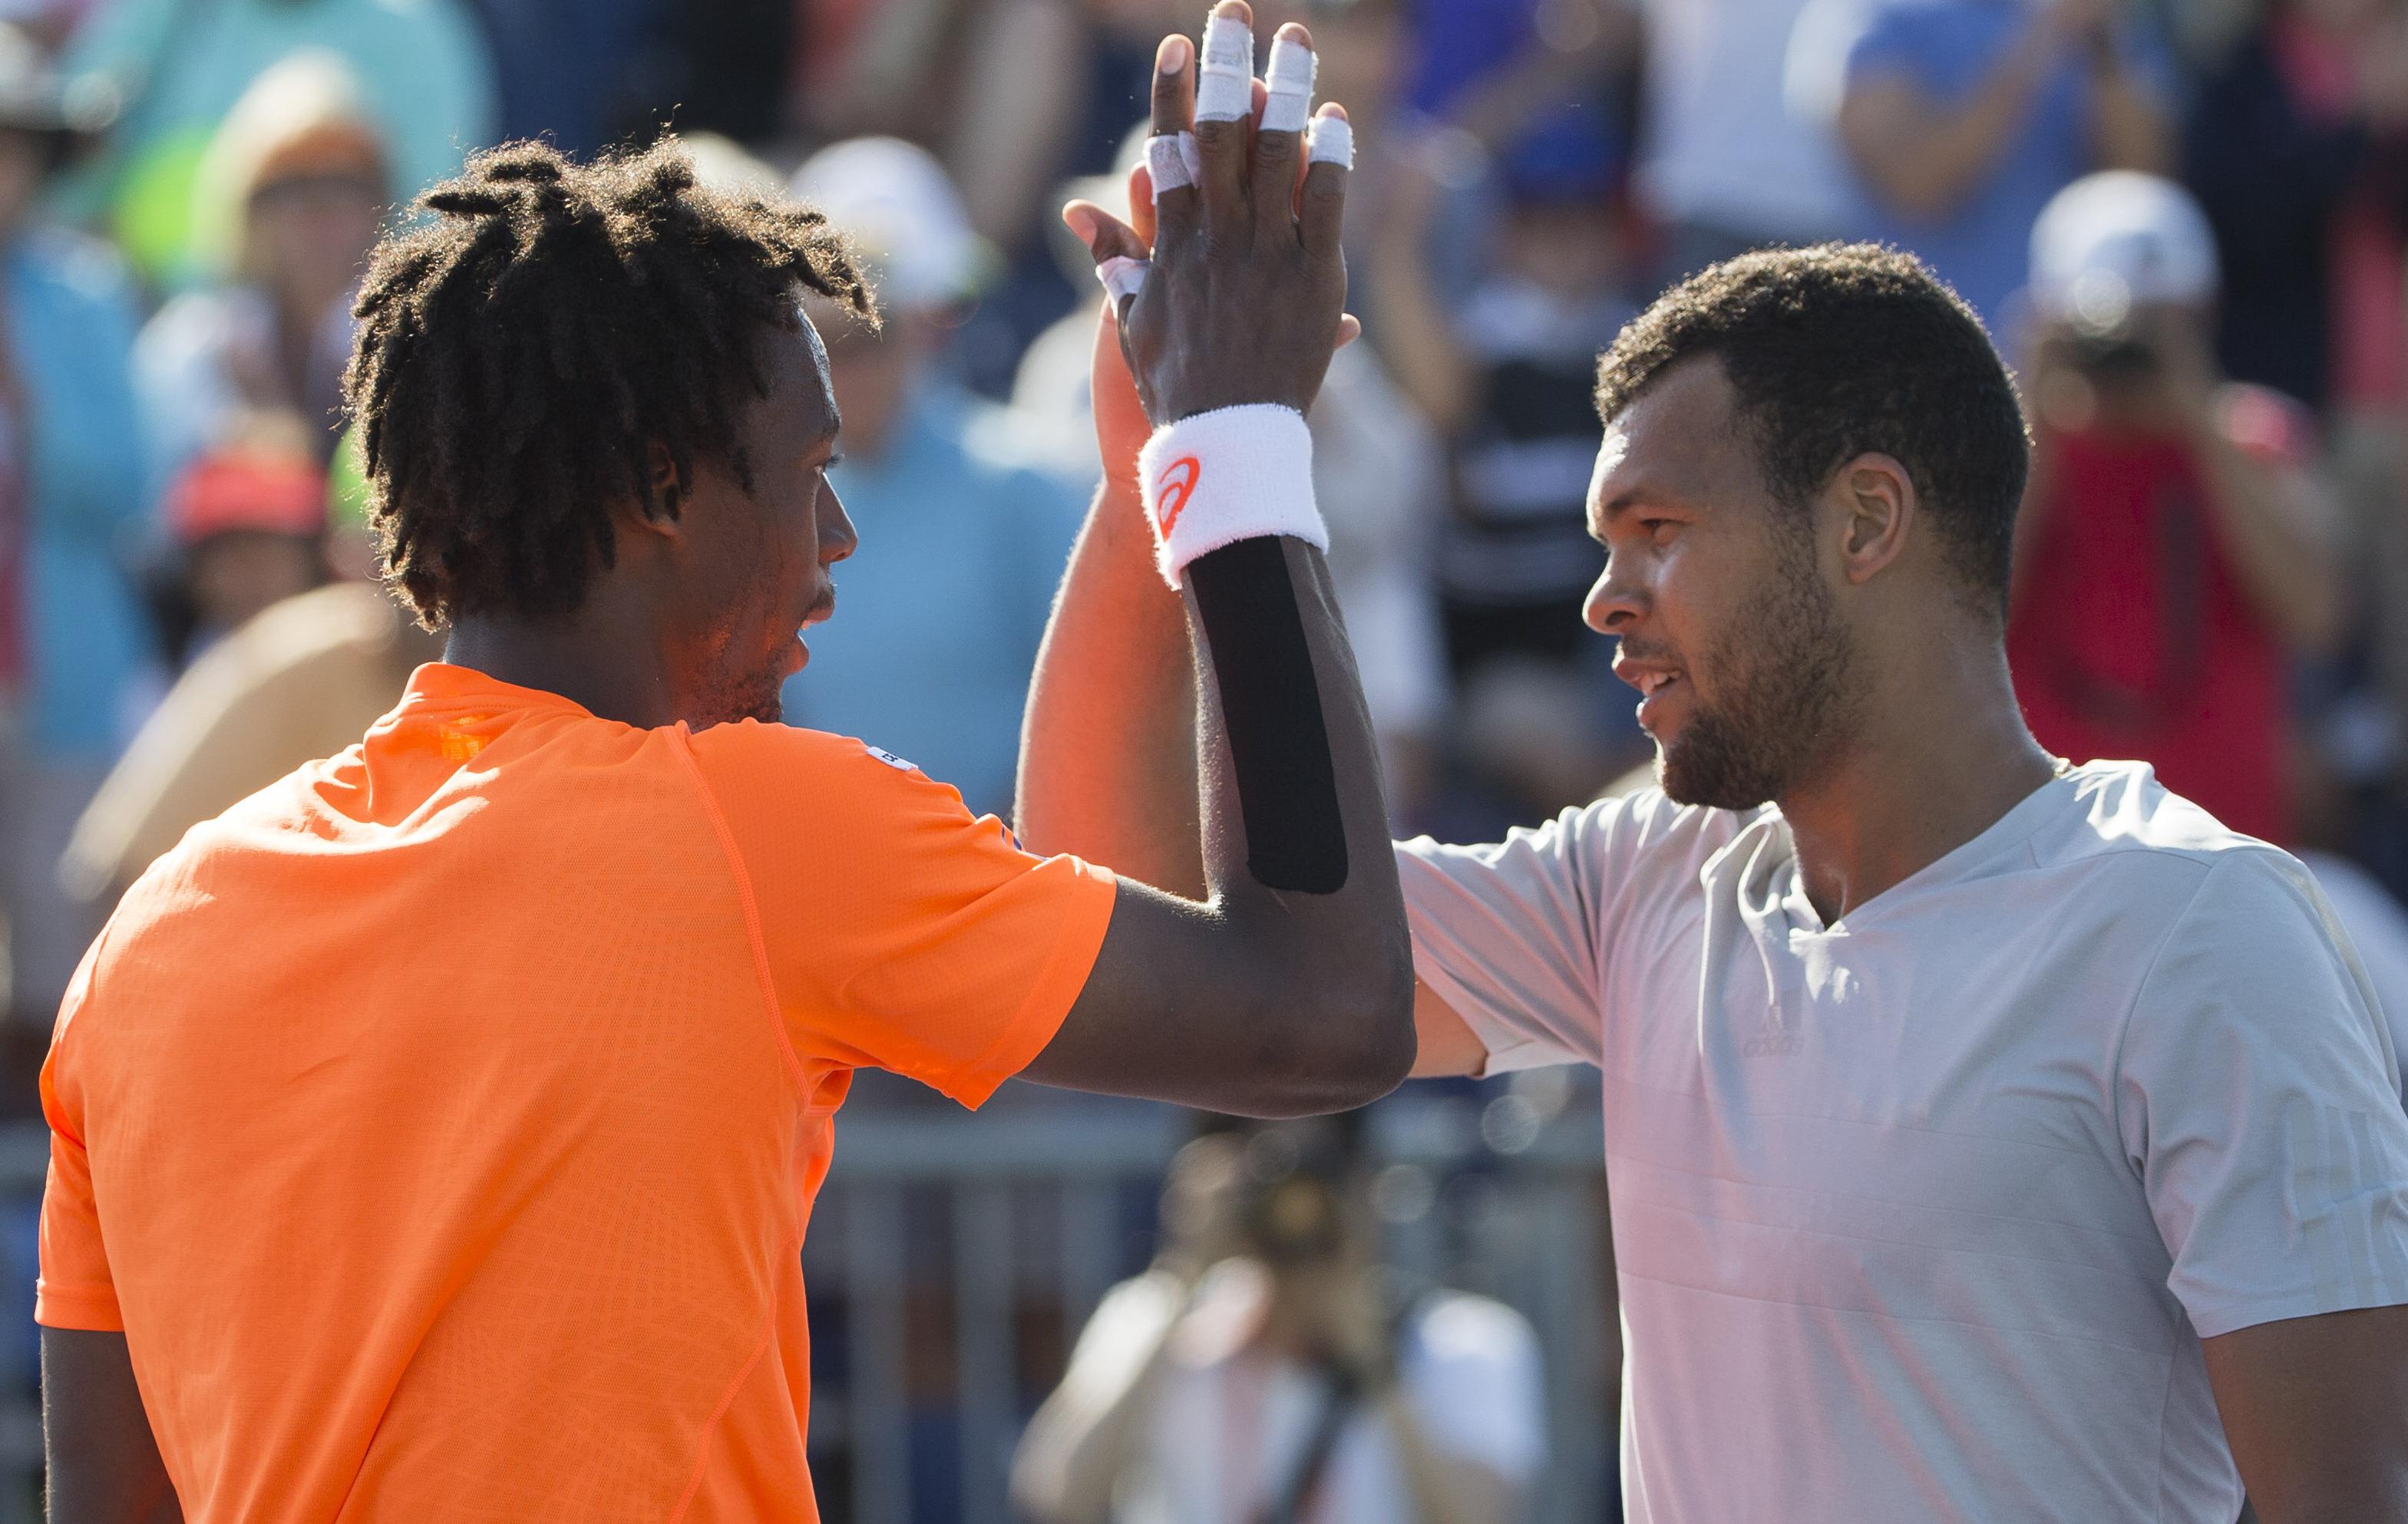 Tennis - US Open - Tsonga contre Monfils au 3e tour ?